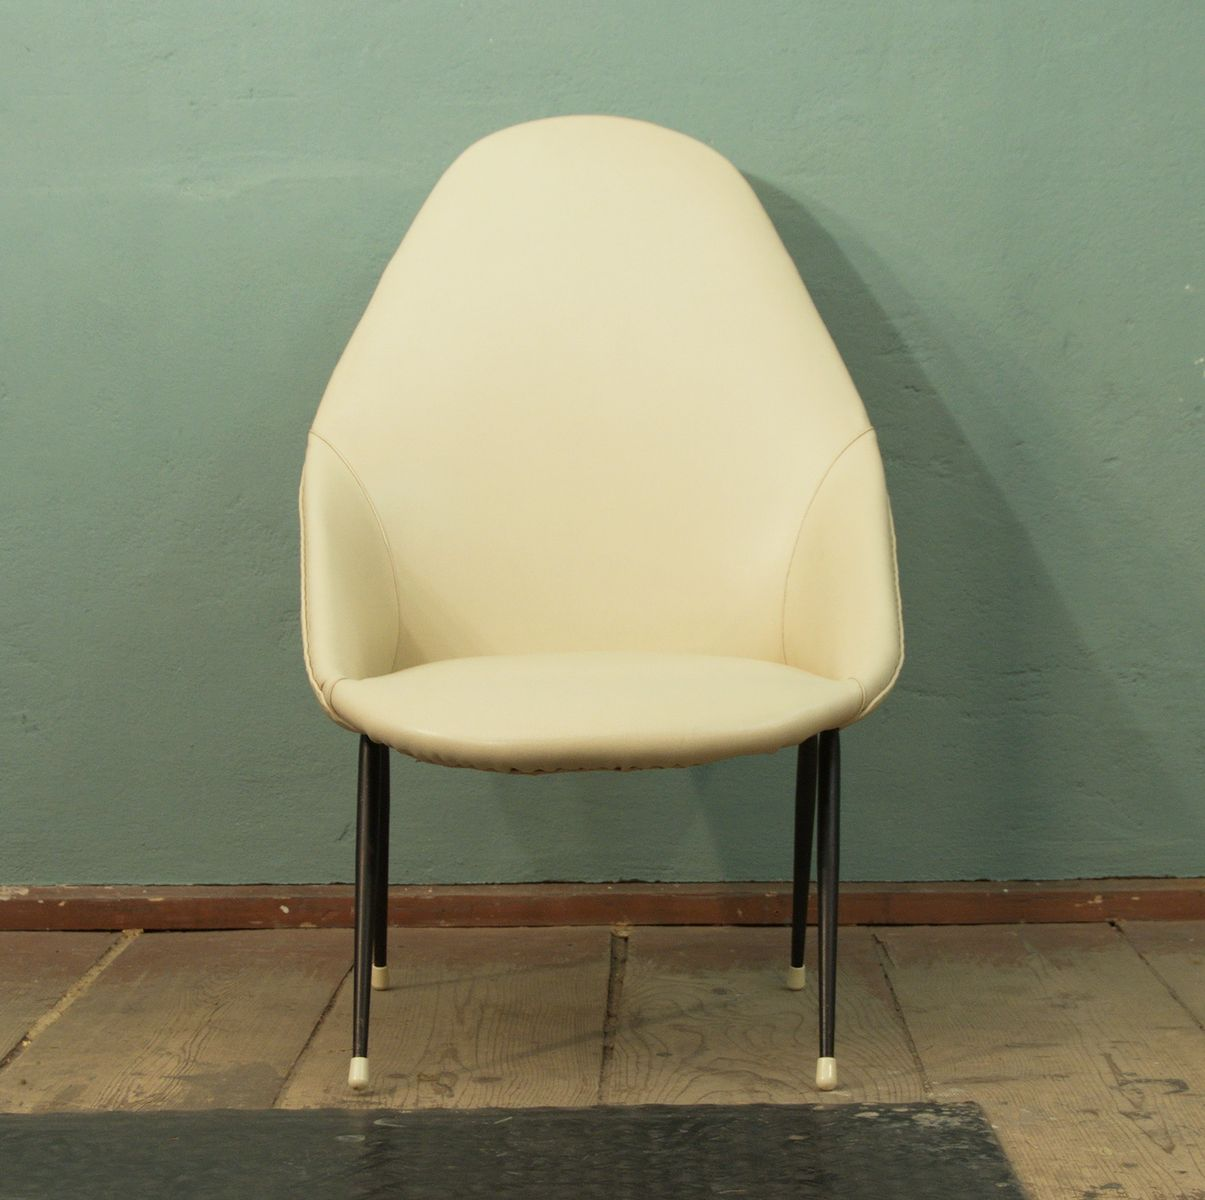 Italienischee Vintage Sessel, 1950er